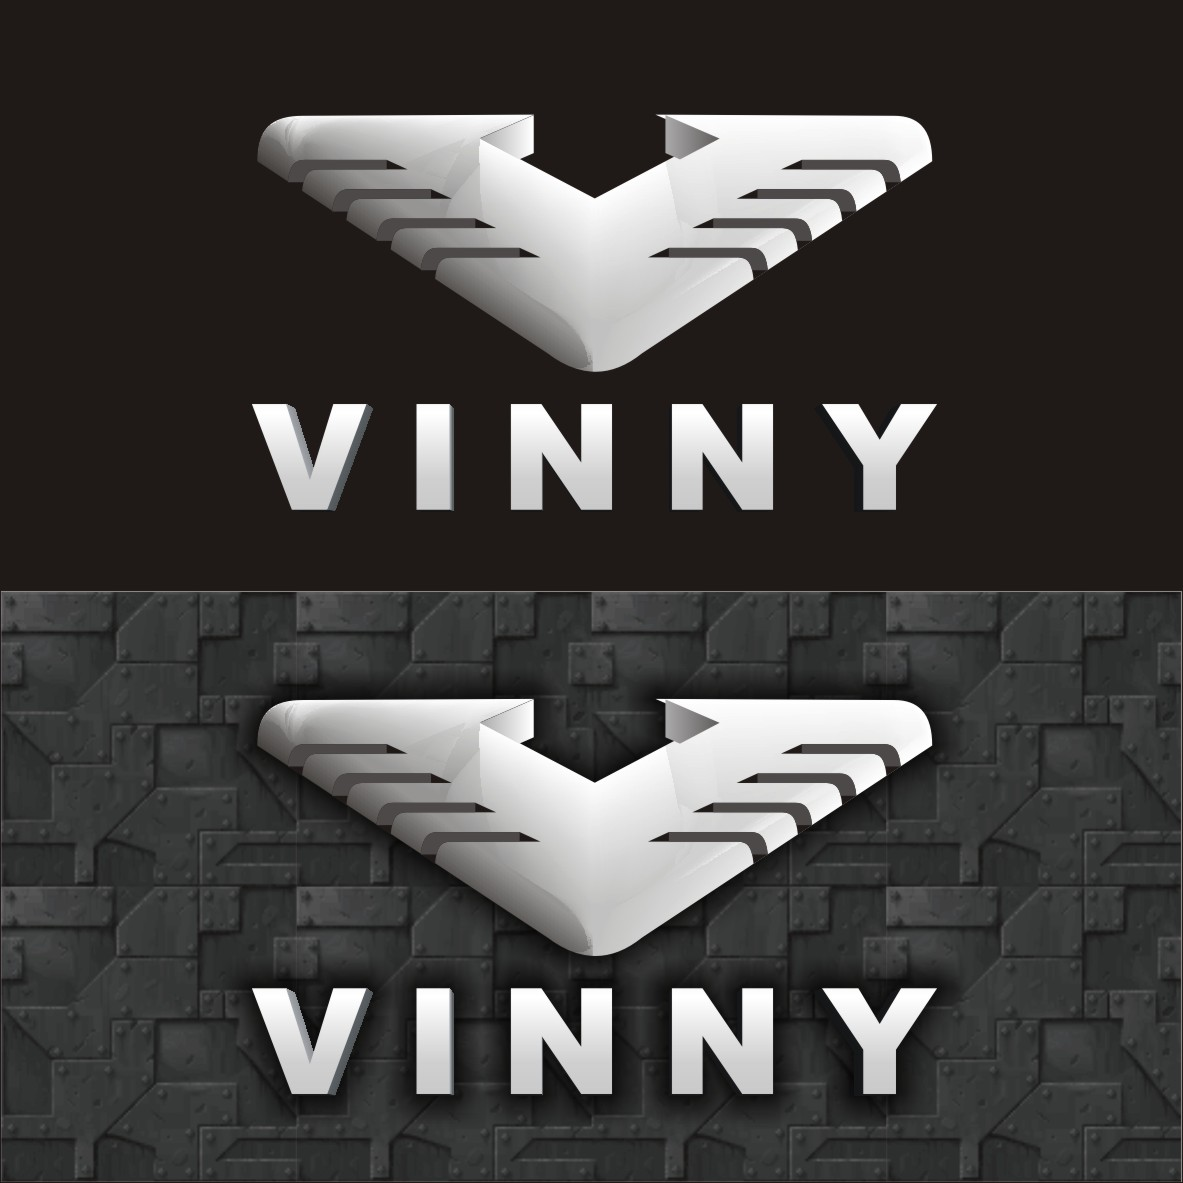 Logo Design by arteo_design - Entry No. 225 in the Logo Design Contest Unique Logo Design Wanted for Vinny.